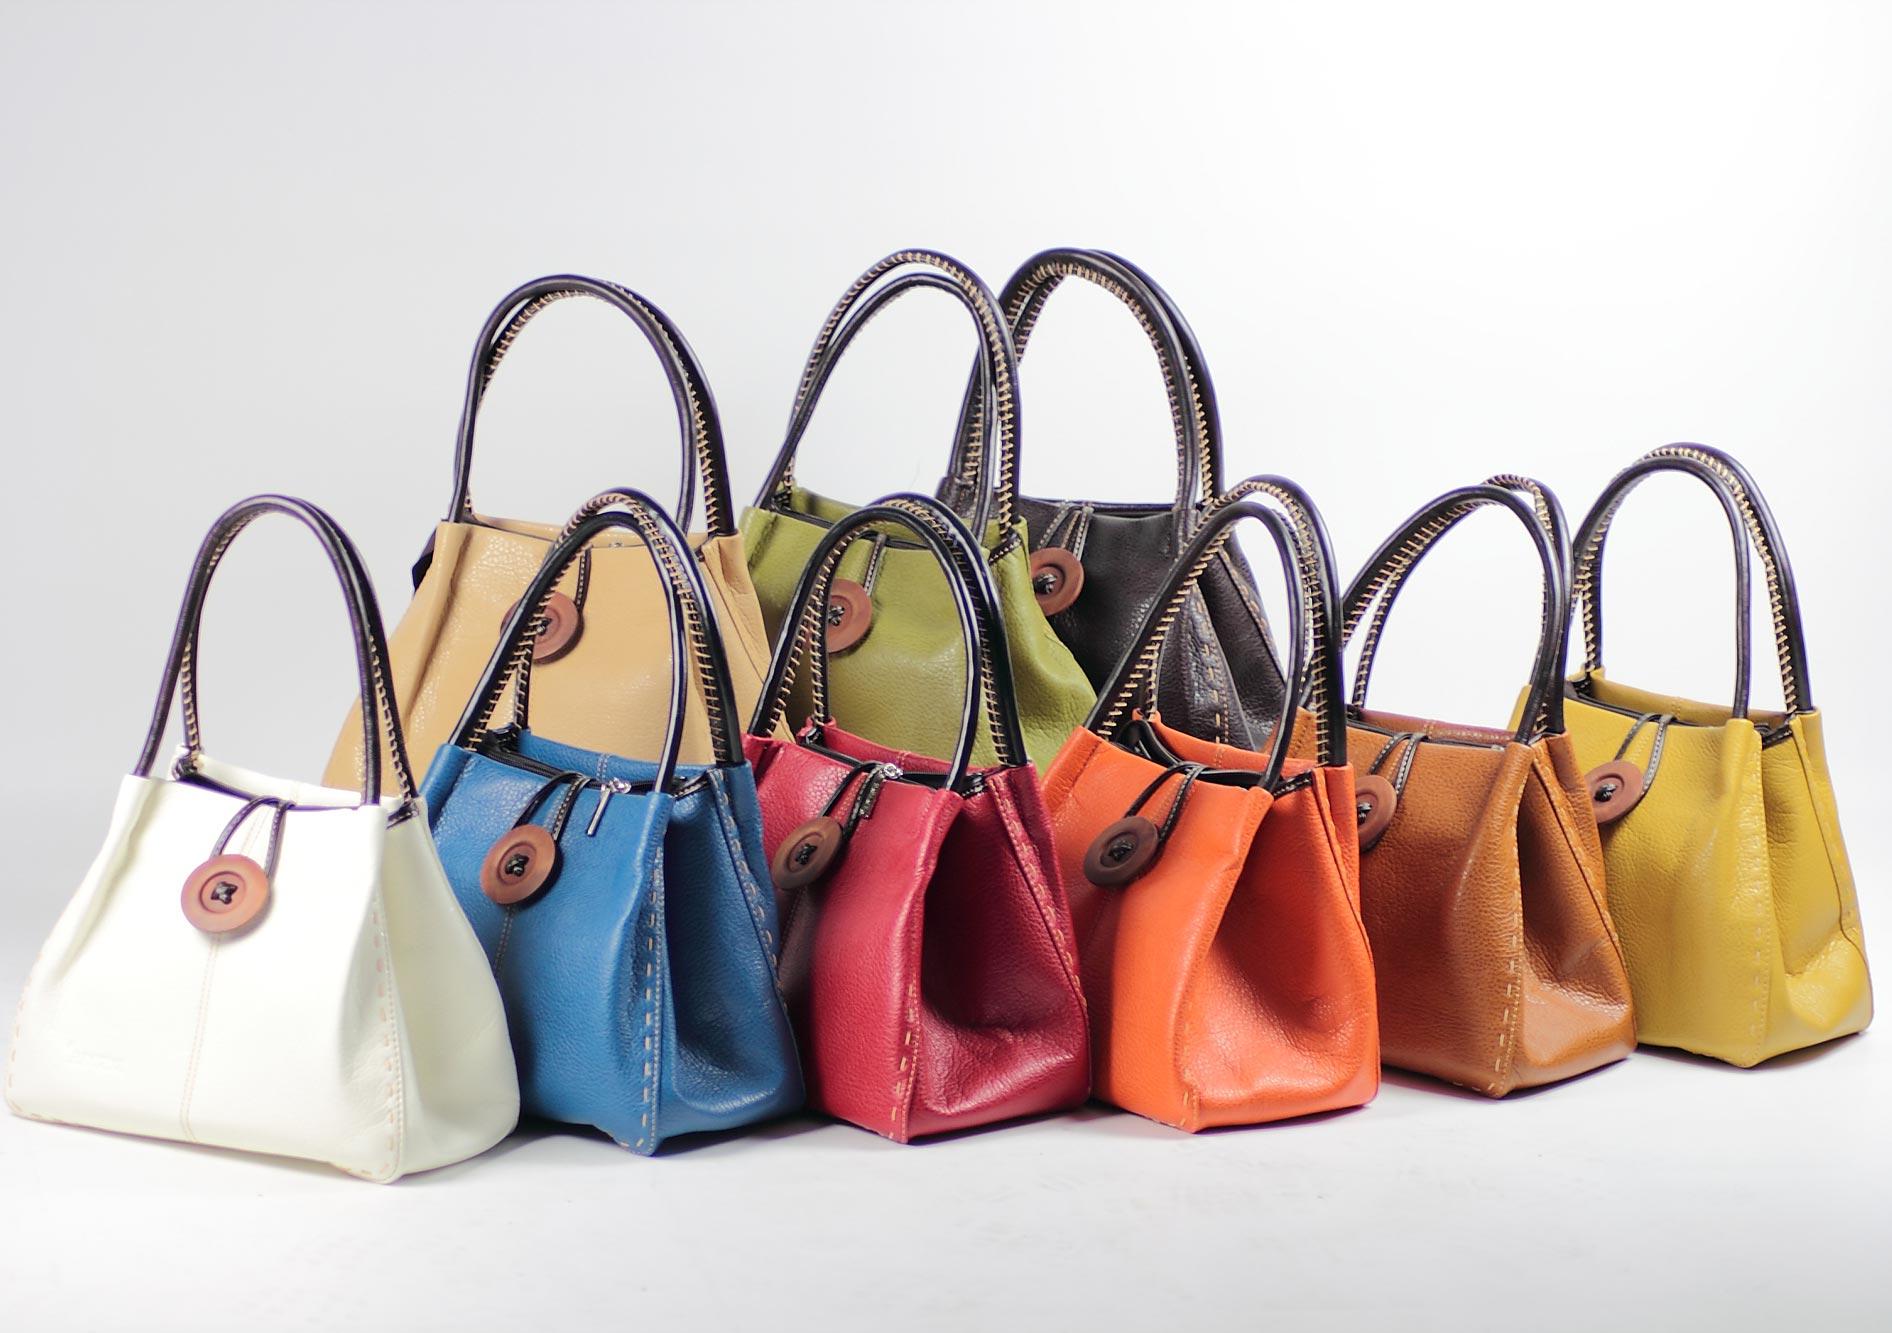 Бизнес план магазина сумок и аксессуаров